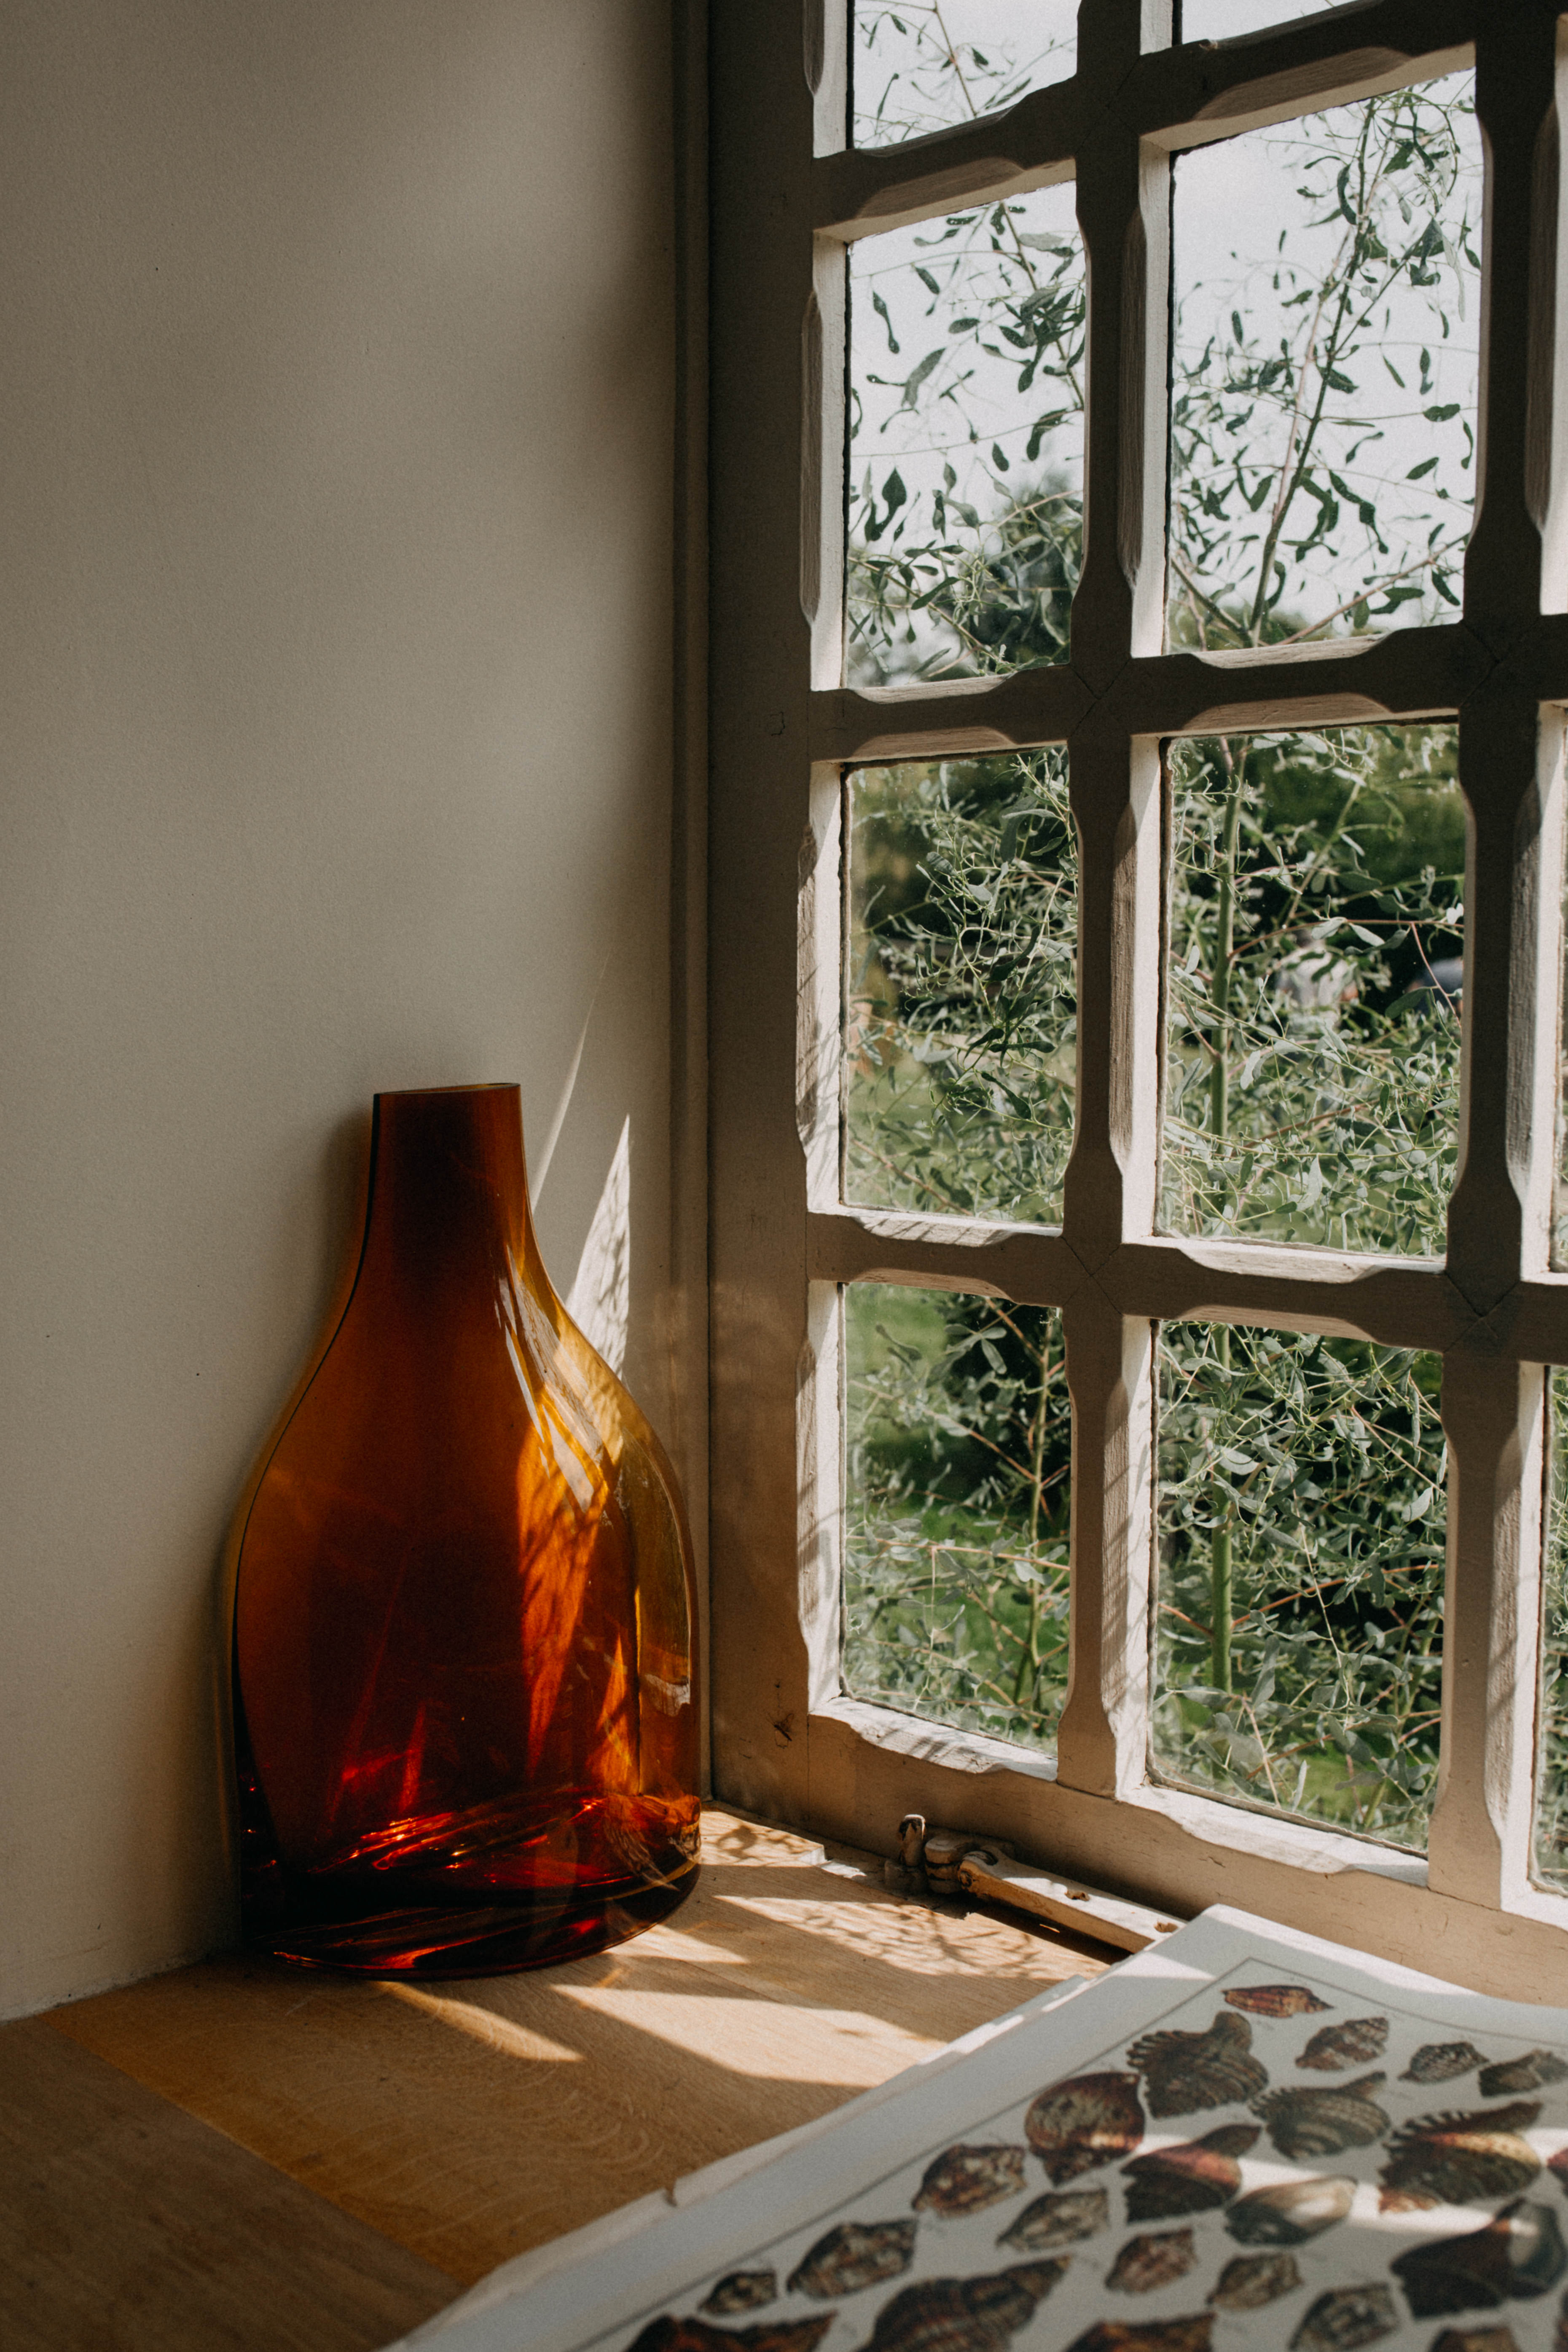 normandie wedding n a la dime de giverny photographe. Black Bedroom Furniture Sets. Home Design Ideas